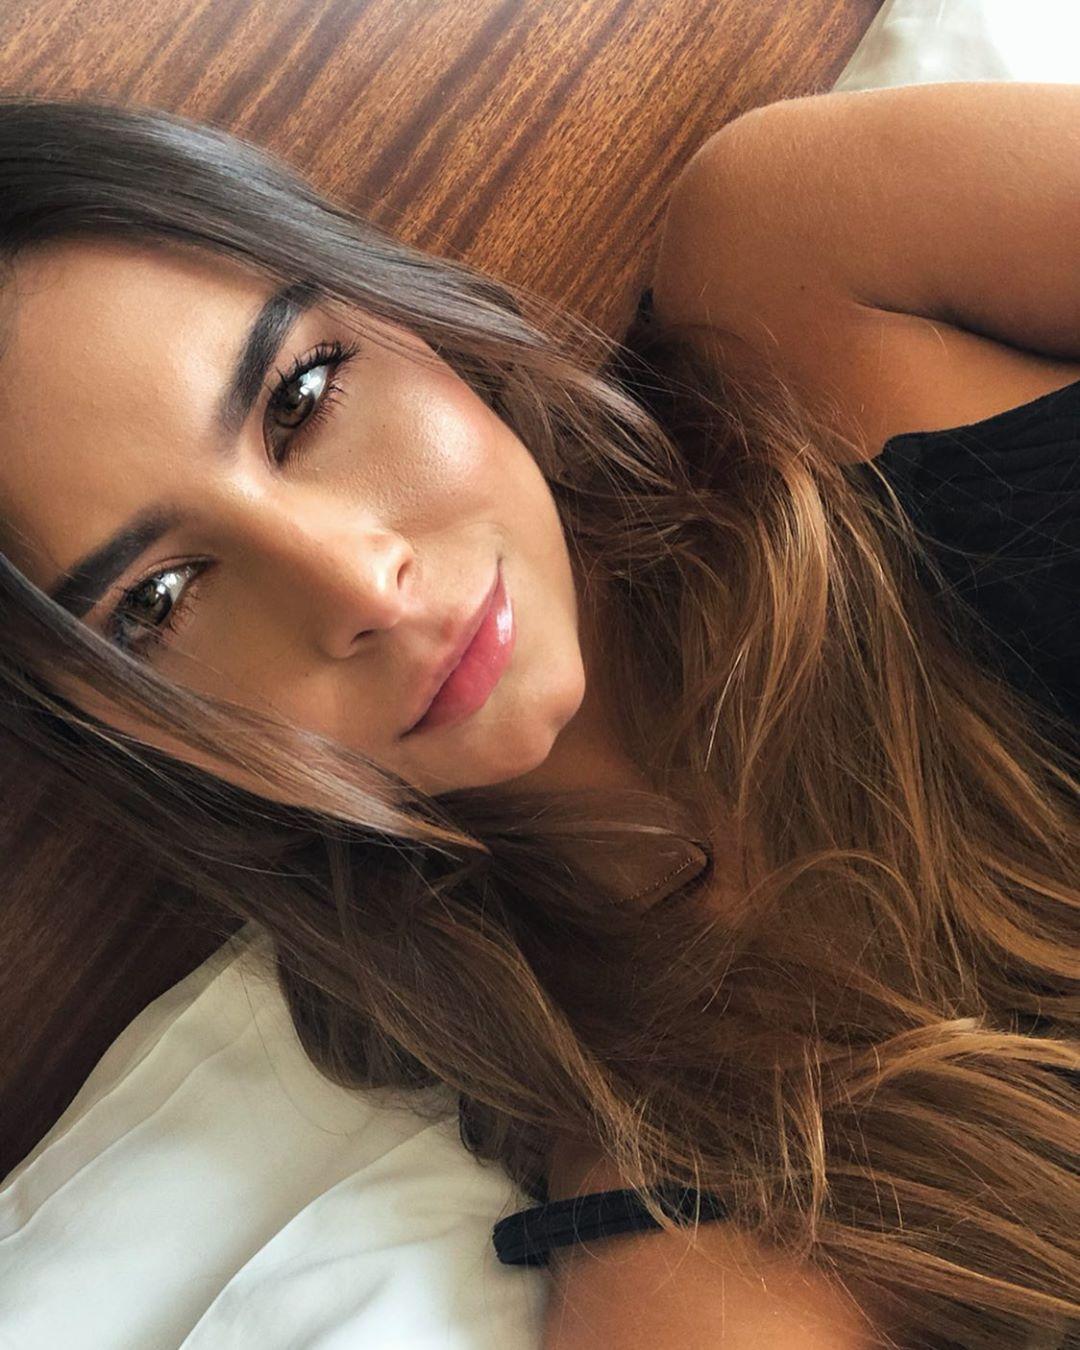 Daniela-Medina-Wallpapers-Insta-FIt-Bio-2